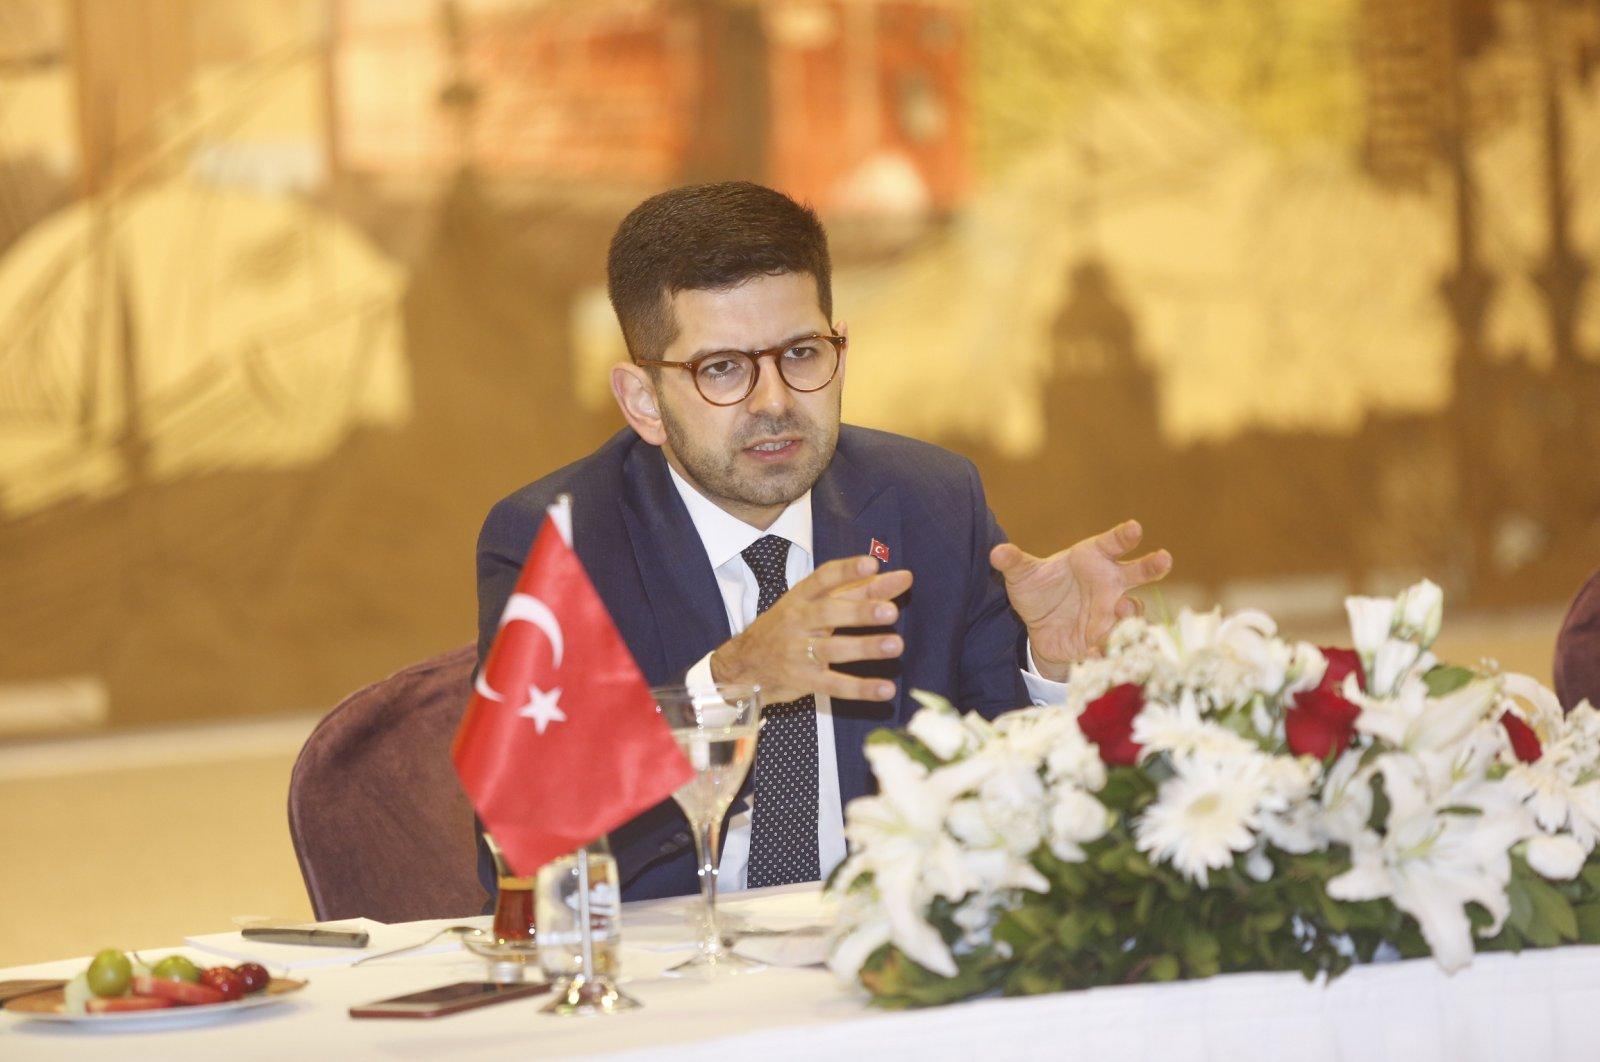 The presidency's Investment Office Chairman Ahmet Burak Dağlıoğlu speaks to press members, Istanbul, Turkey on July 3, 2020. (Photo courtesy of Investment Office)